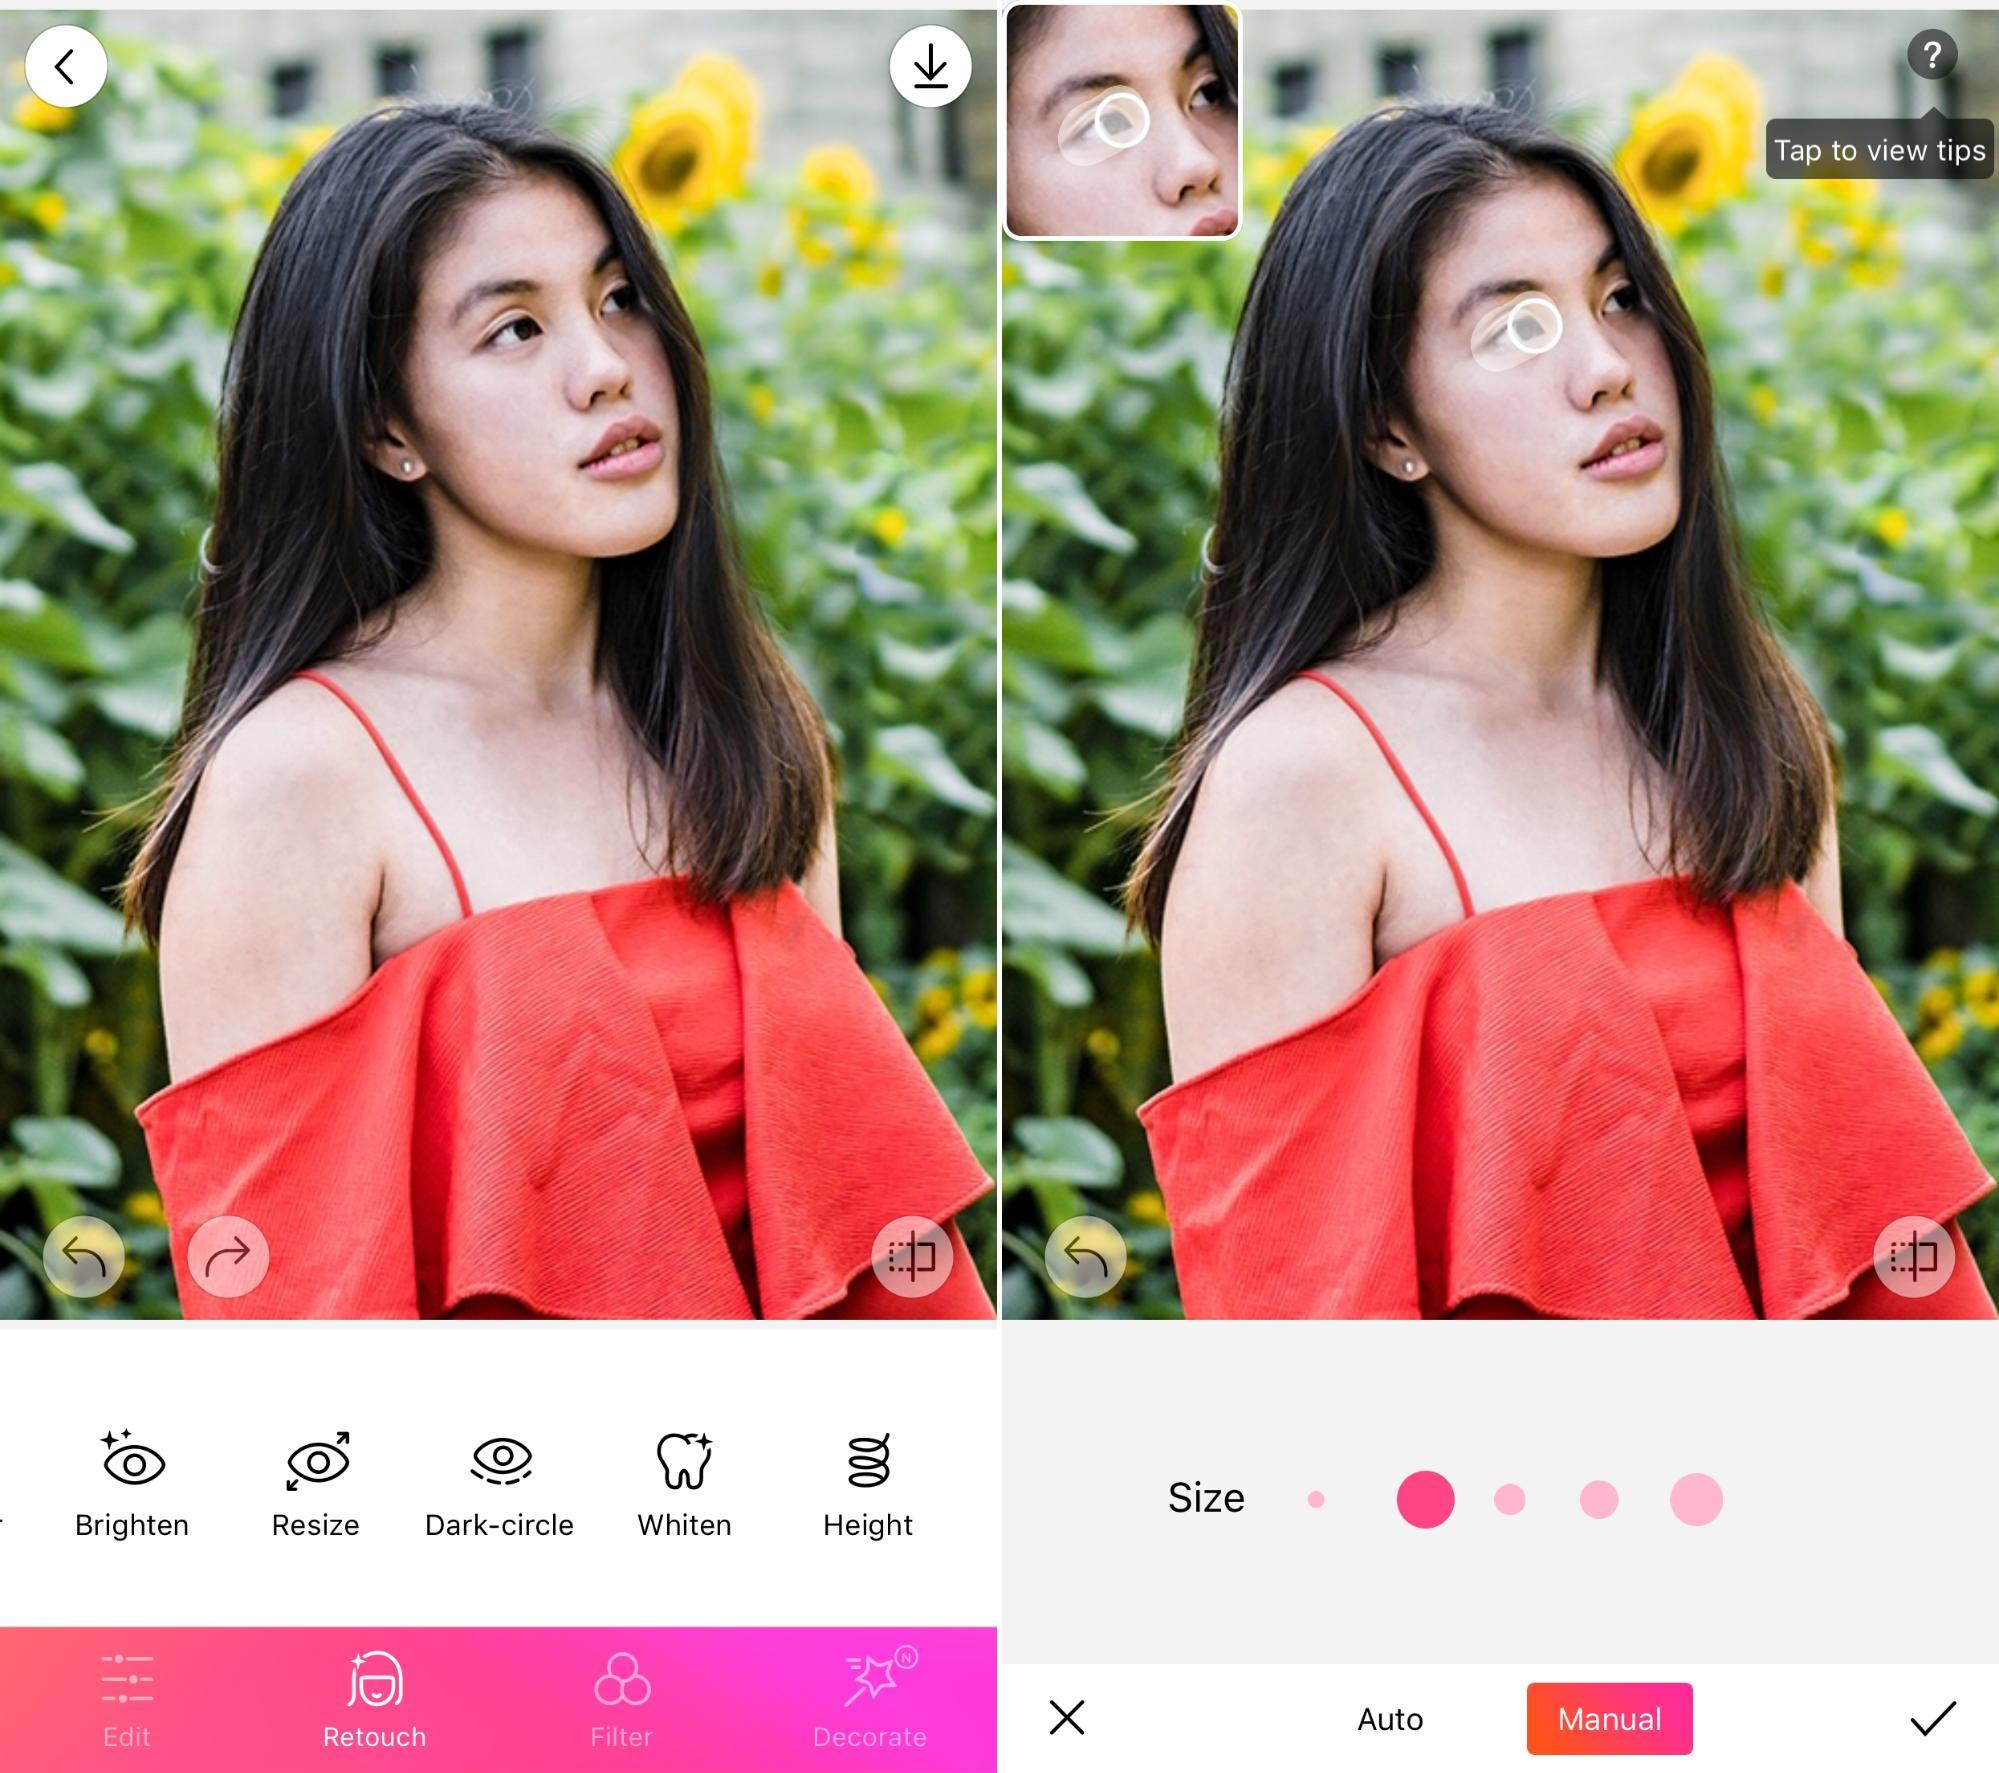 Beautyplus 修图软件 - 肖像照片